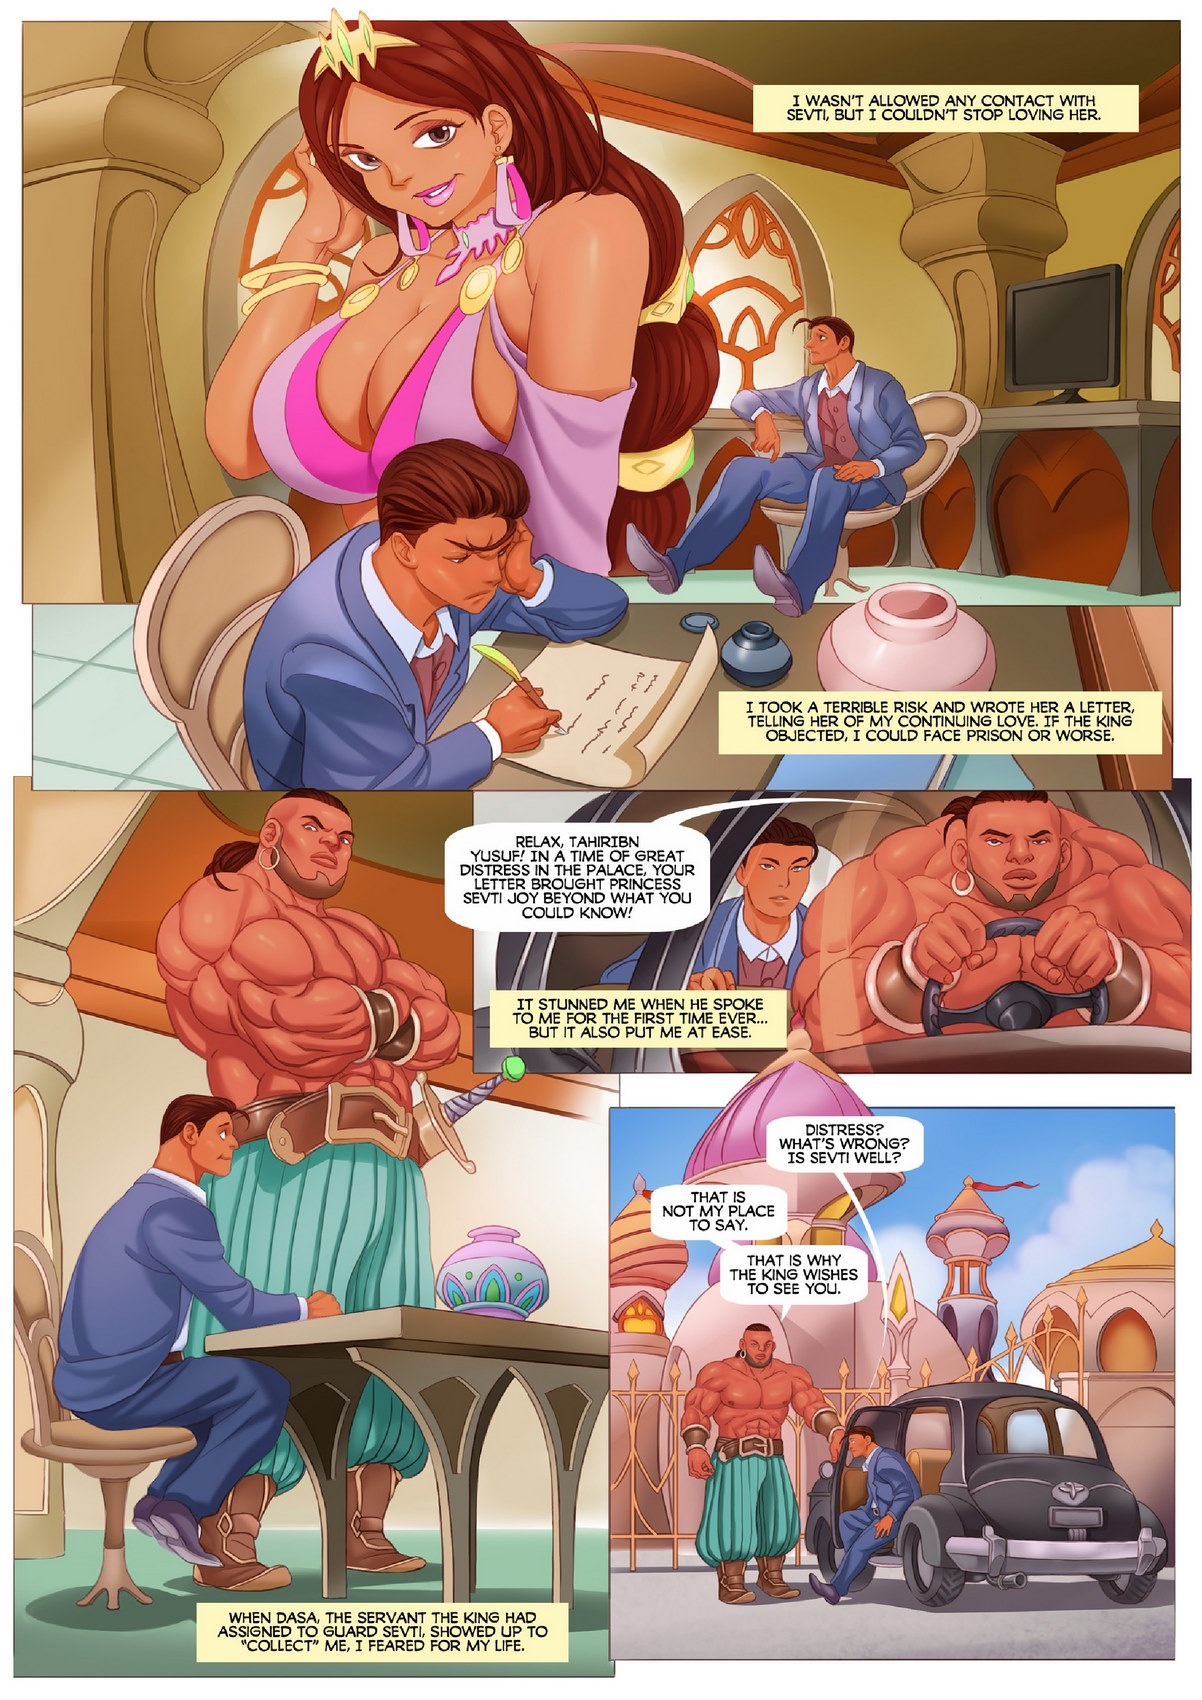 Giantess porn butt comics